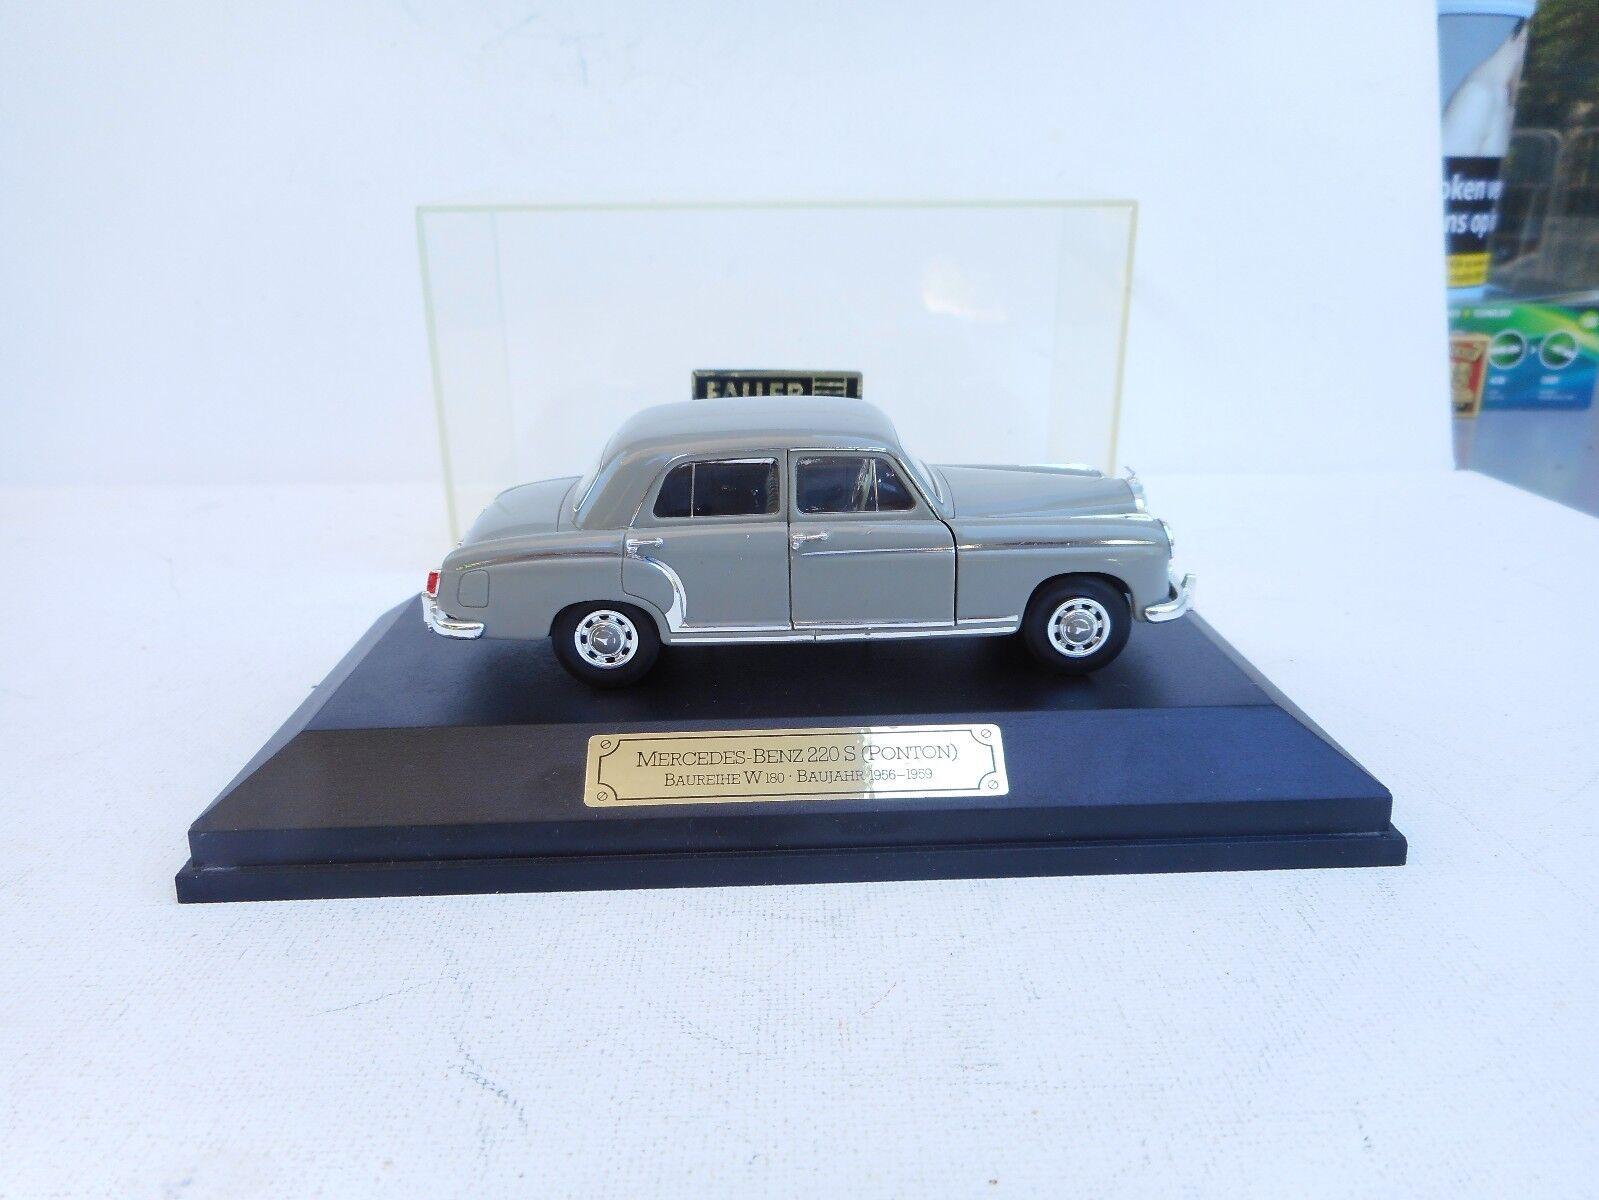 1 43 Faller Memory bils grå Grun Mercedes -Benz 220 S Ponton 1 43